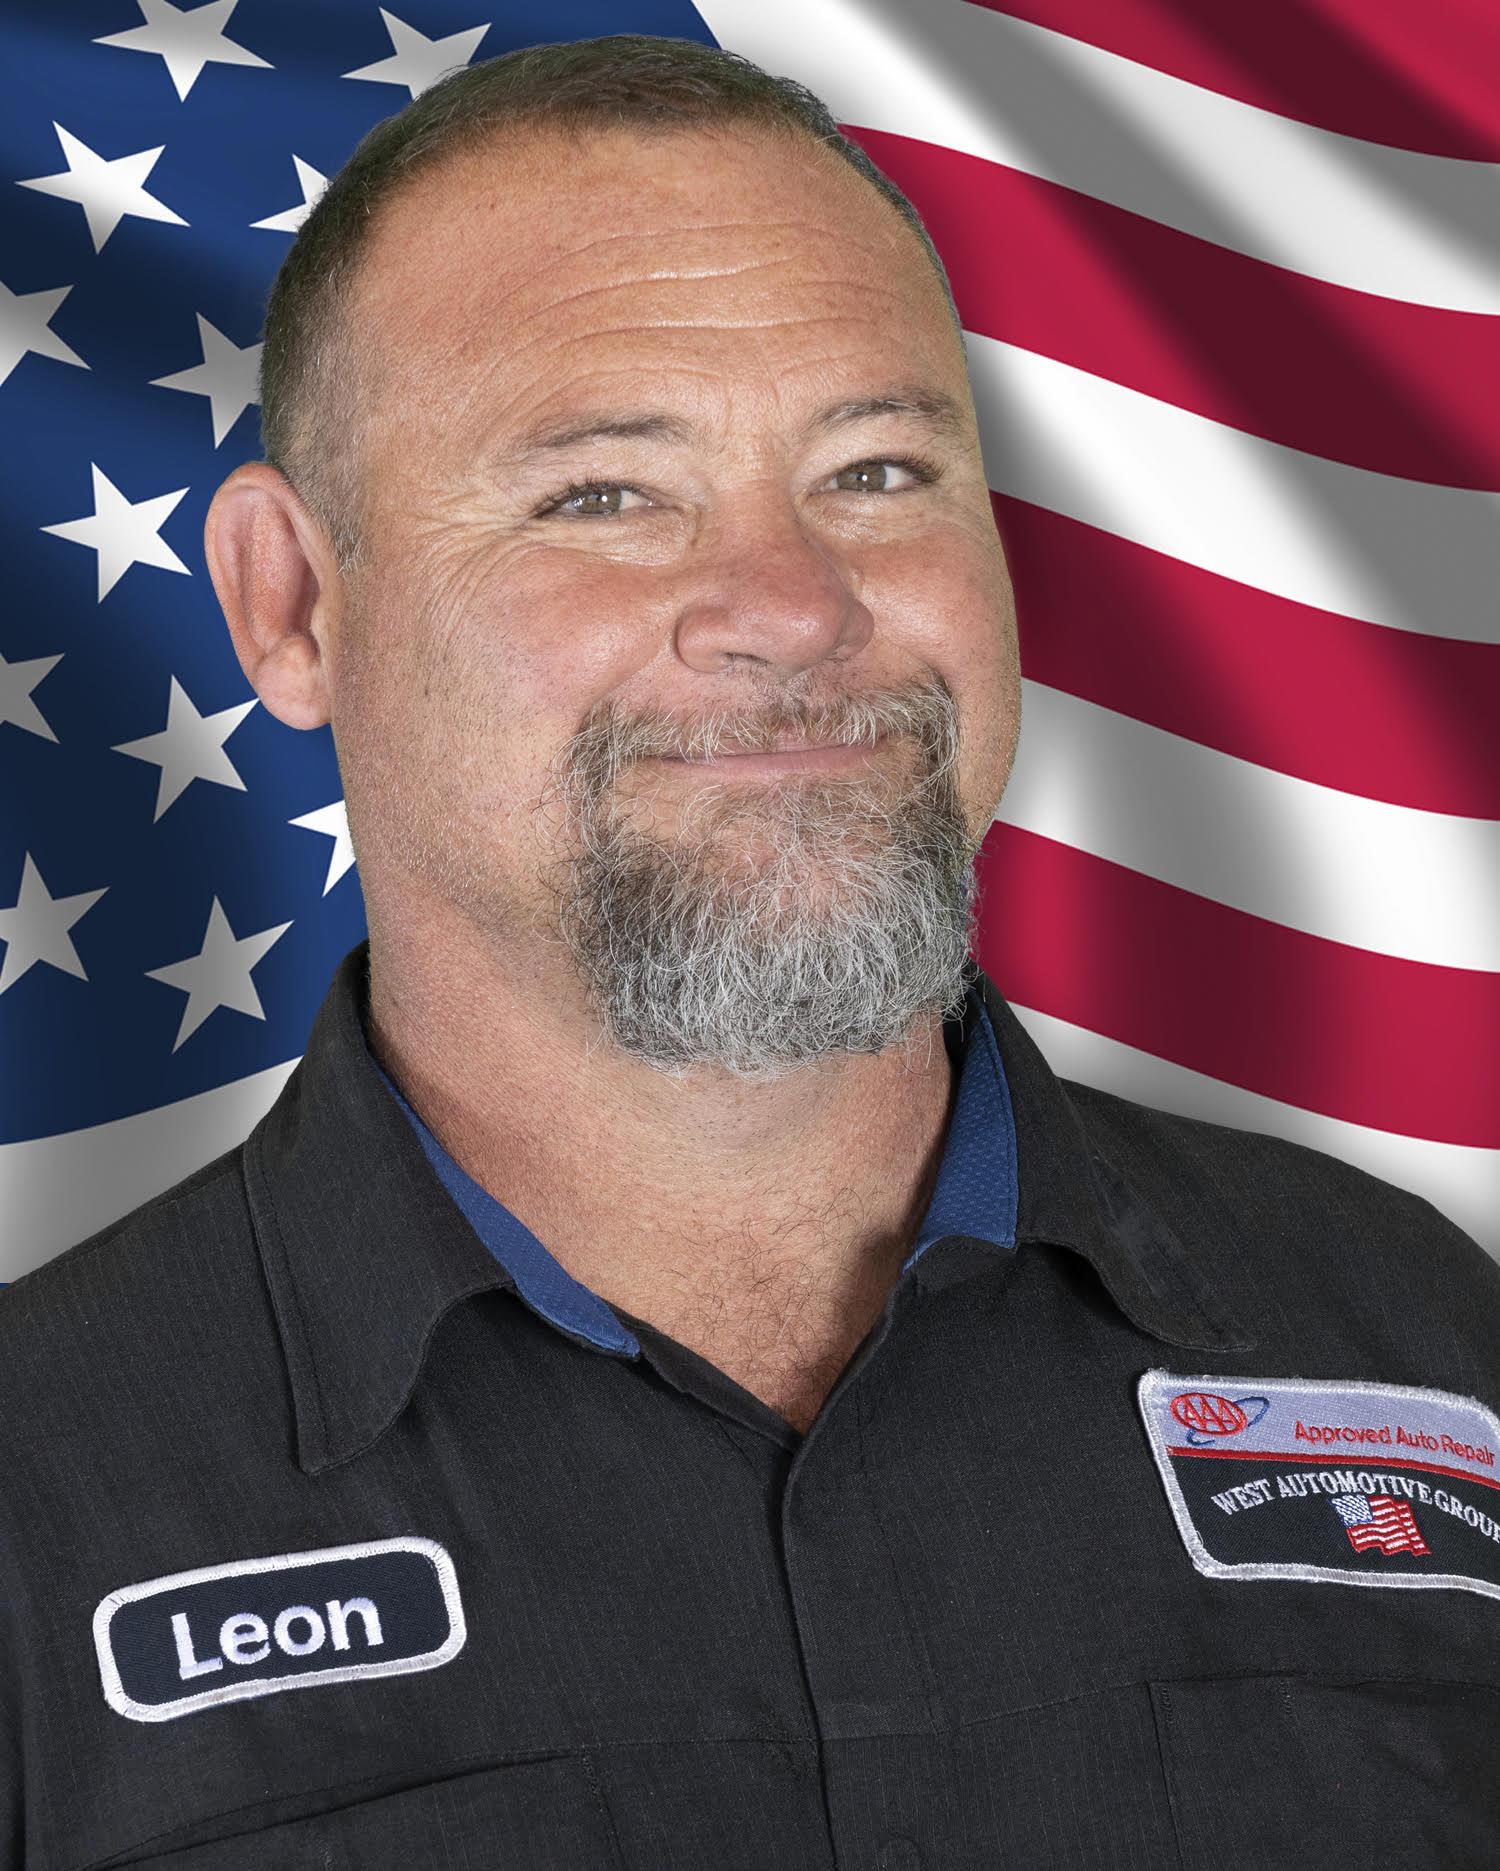 Leon Phillips